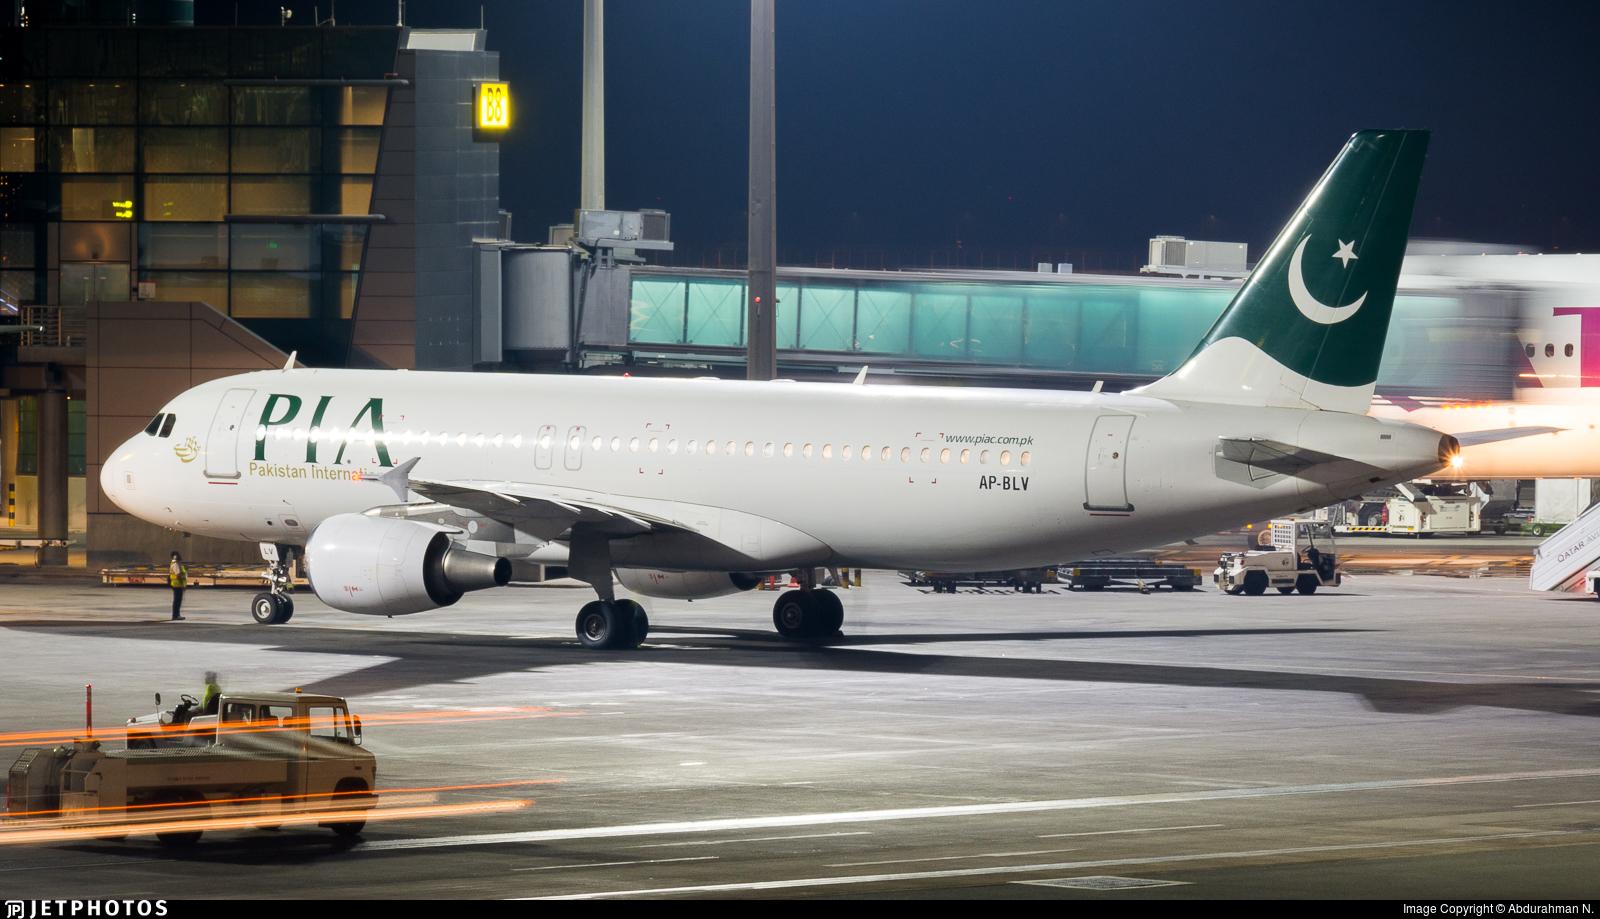 Pia flight track